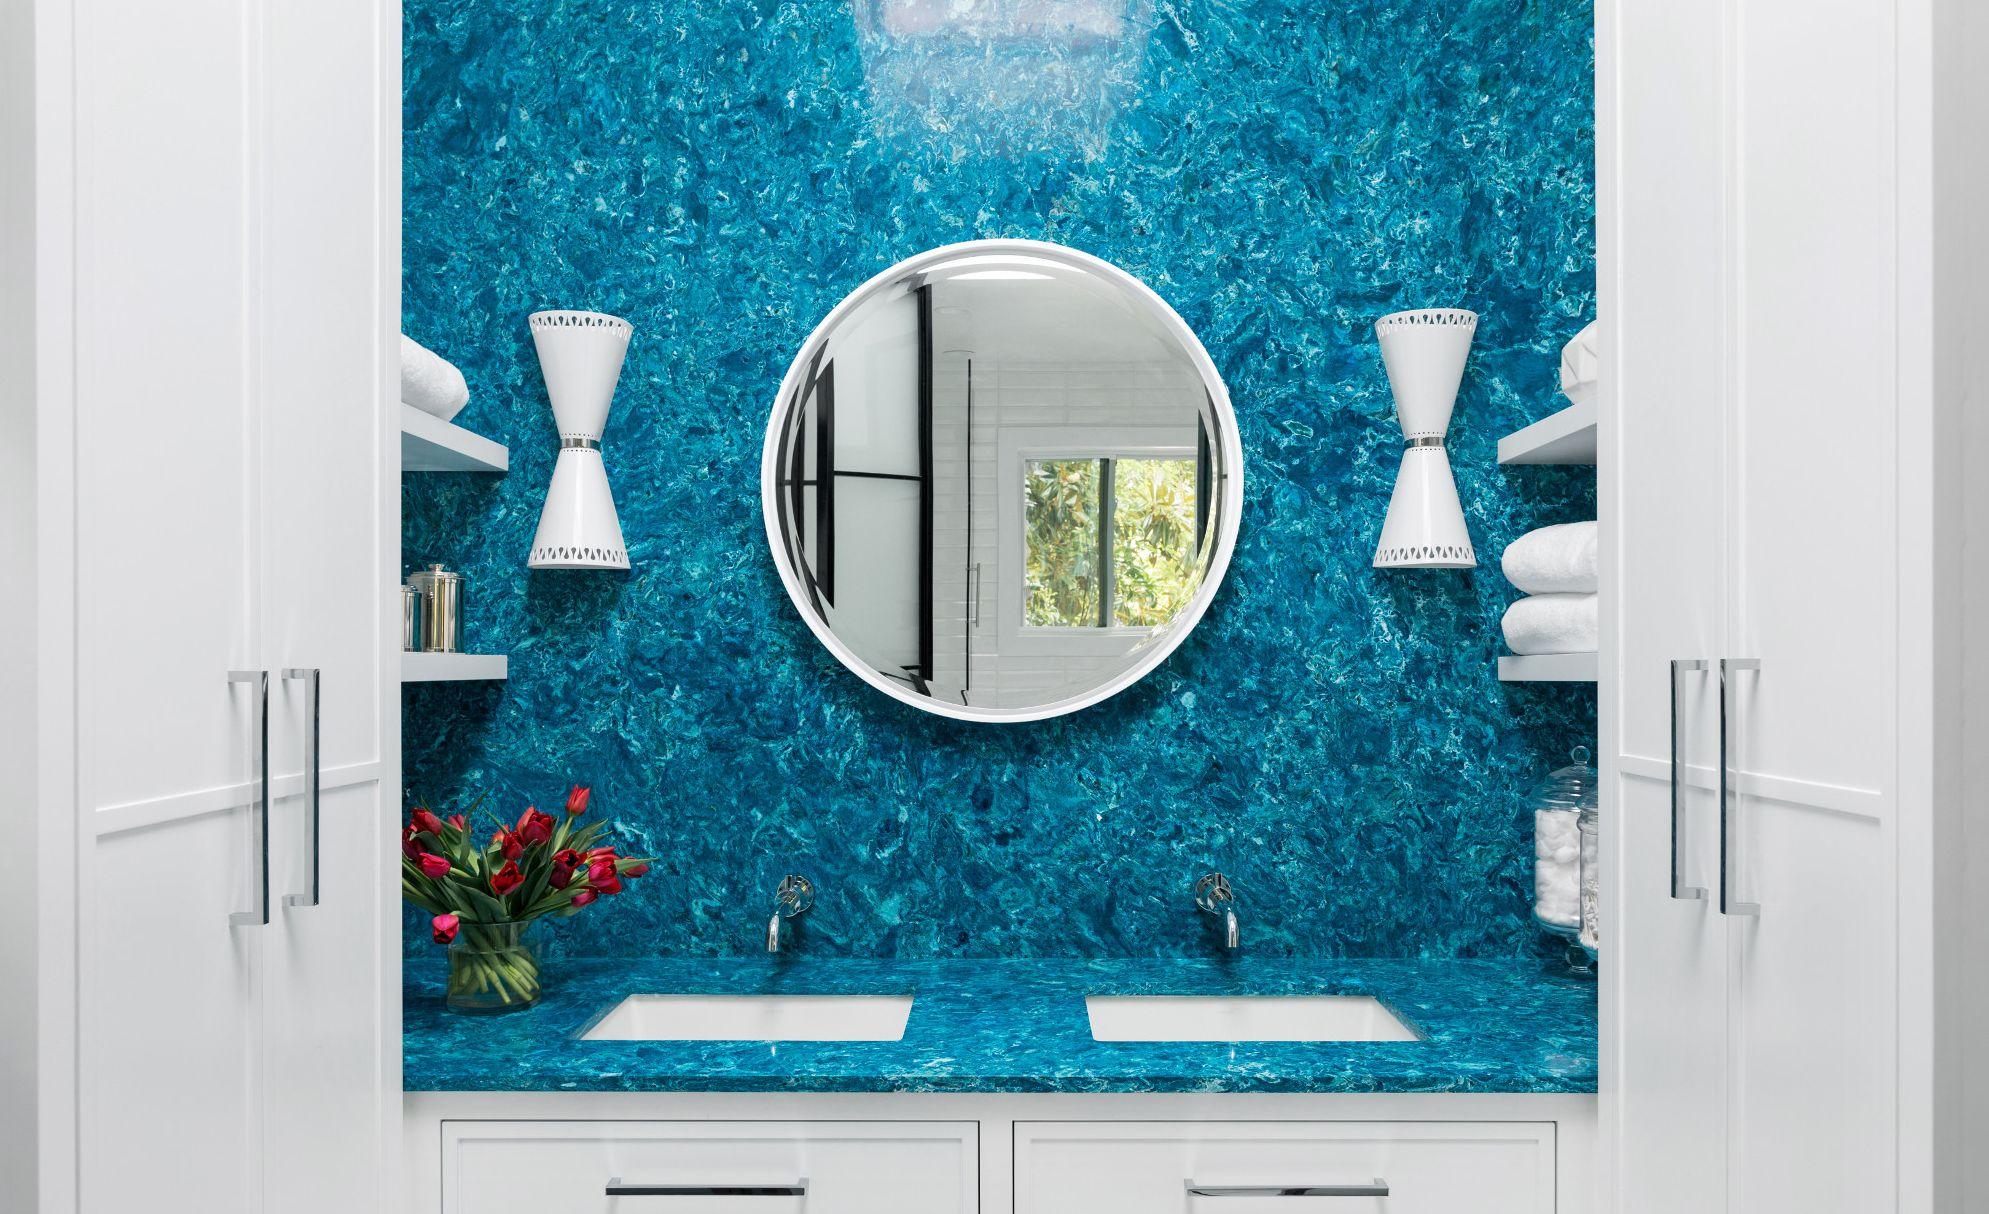 Bright blue Cambria Skye vanity and backsplash.